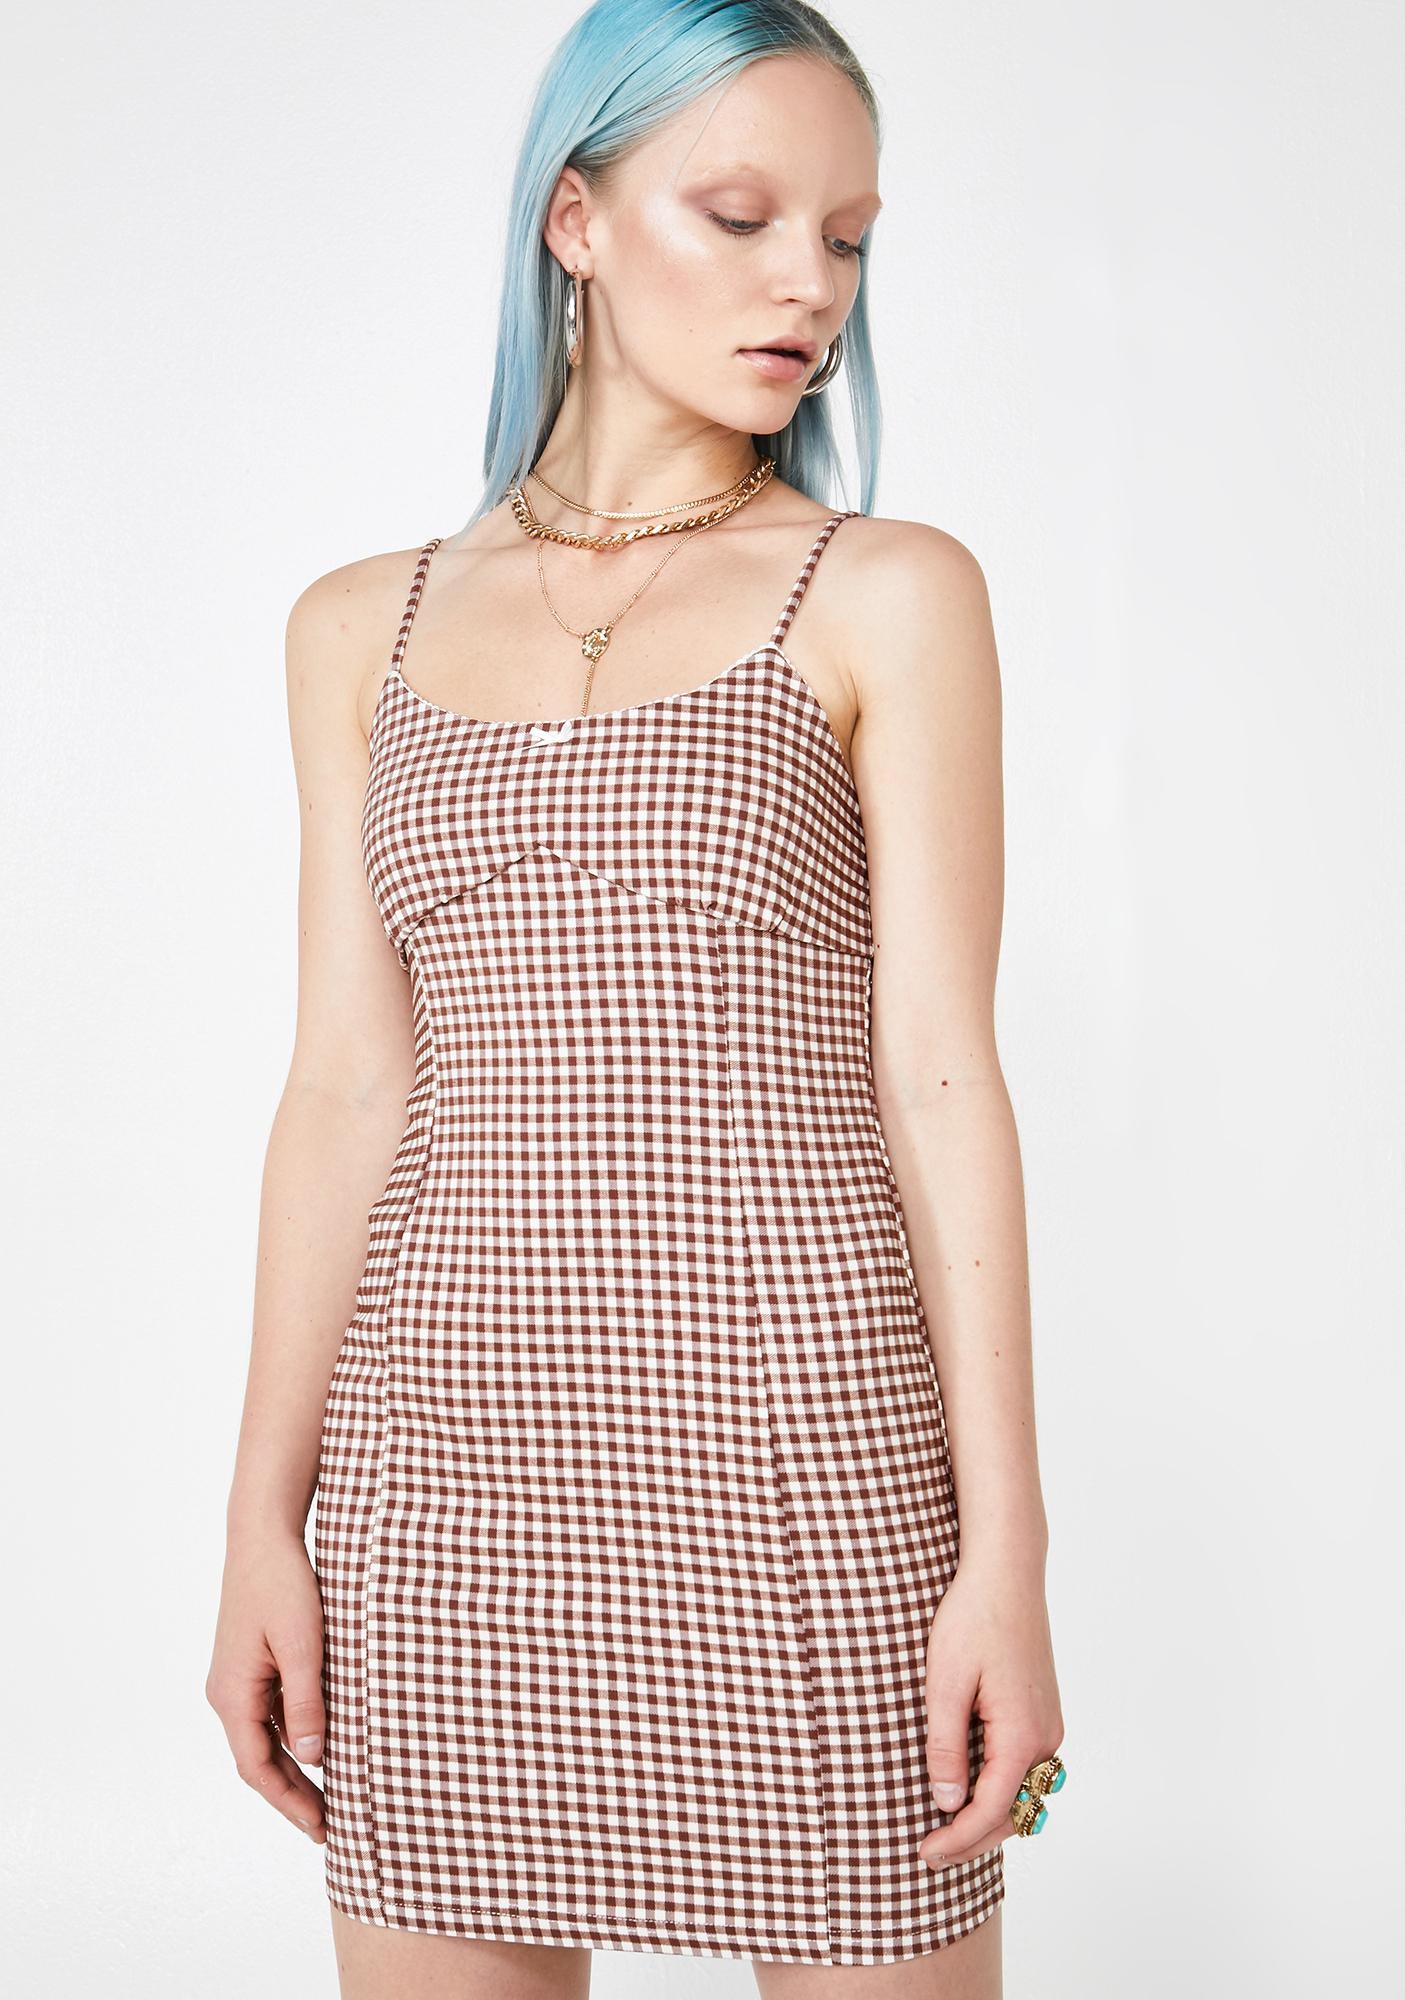 Brunch Babe Gingham Dress